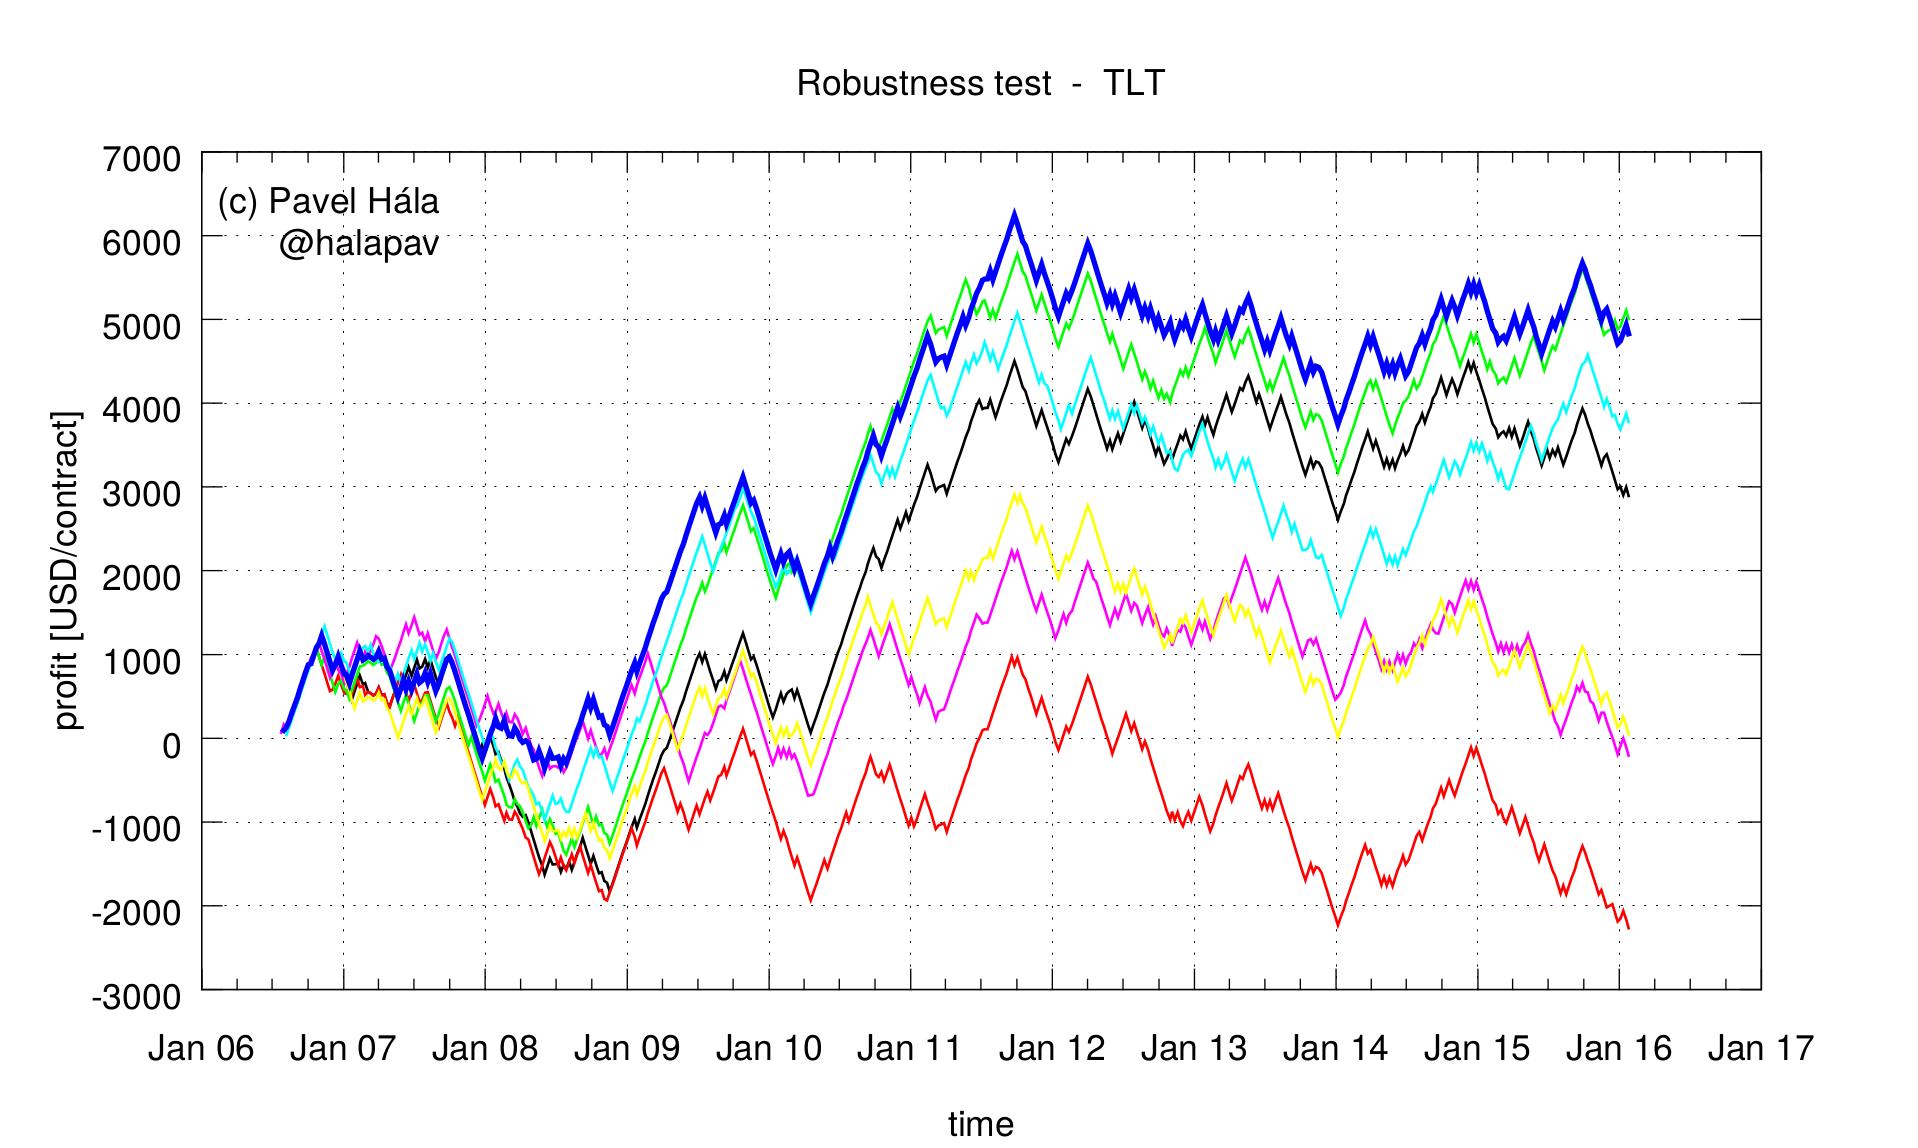 tlt_robustness